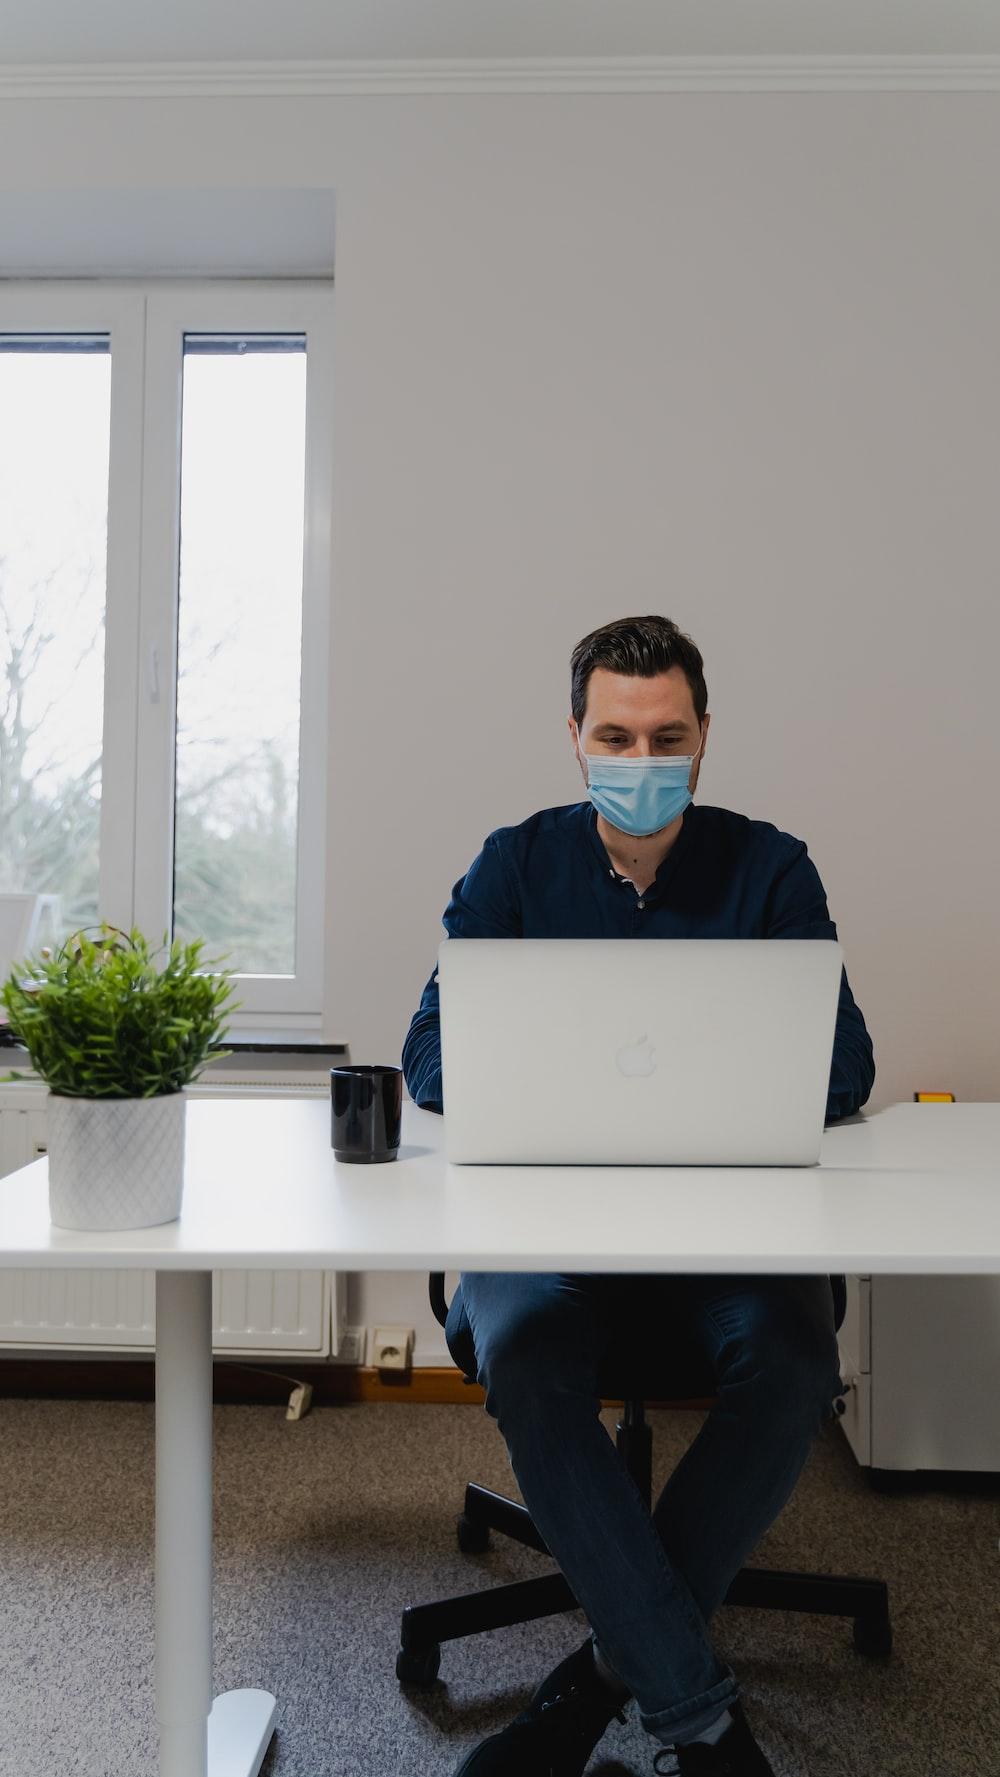 man in blue dress shirt using silver macbook